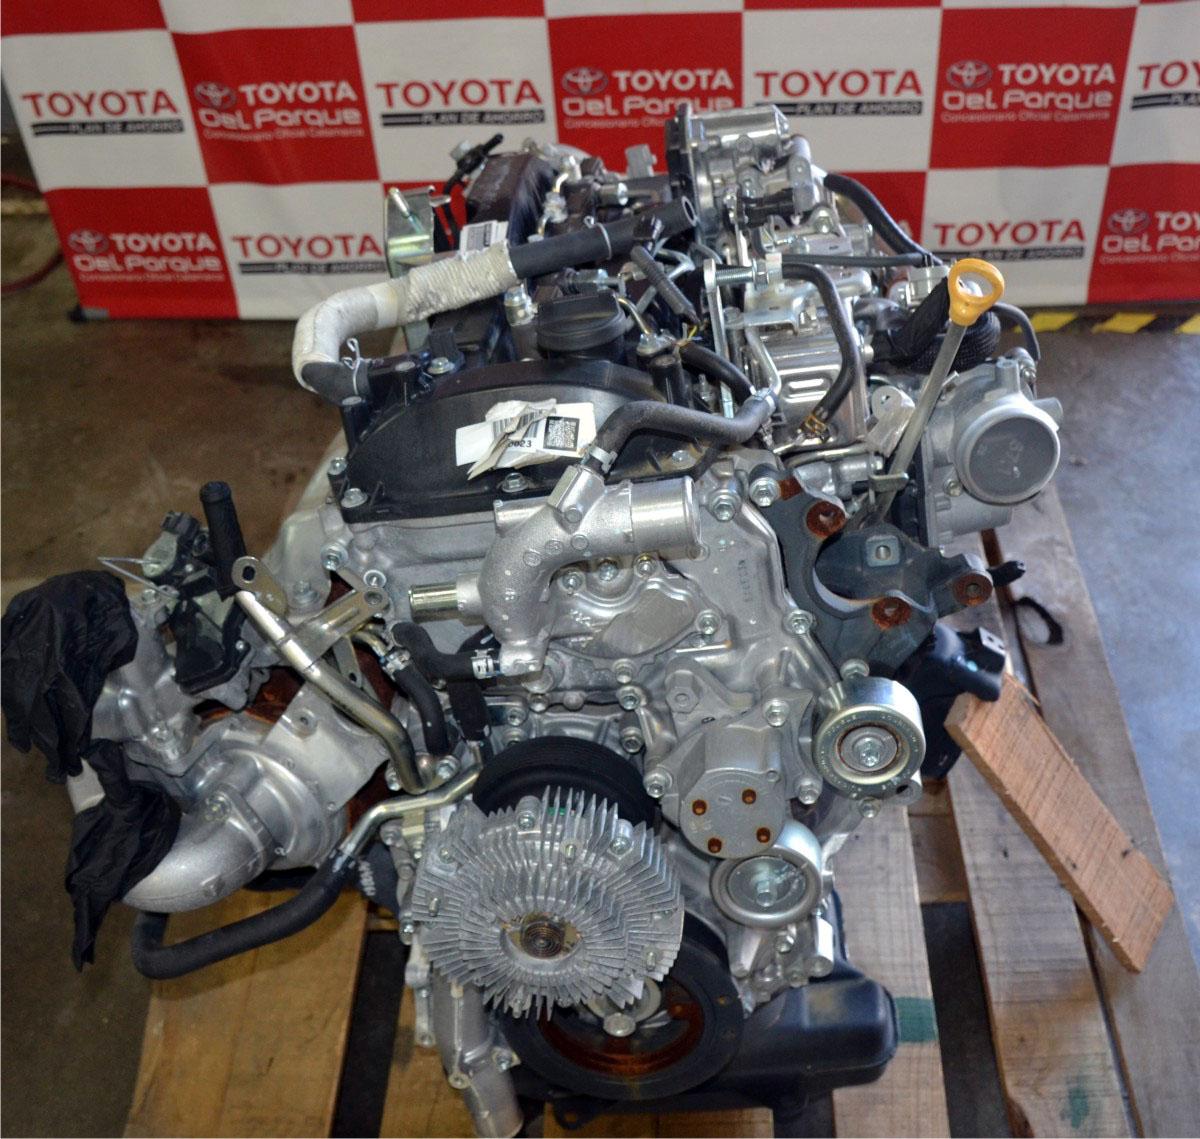 Toyota 123456